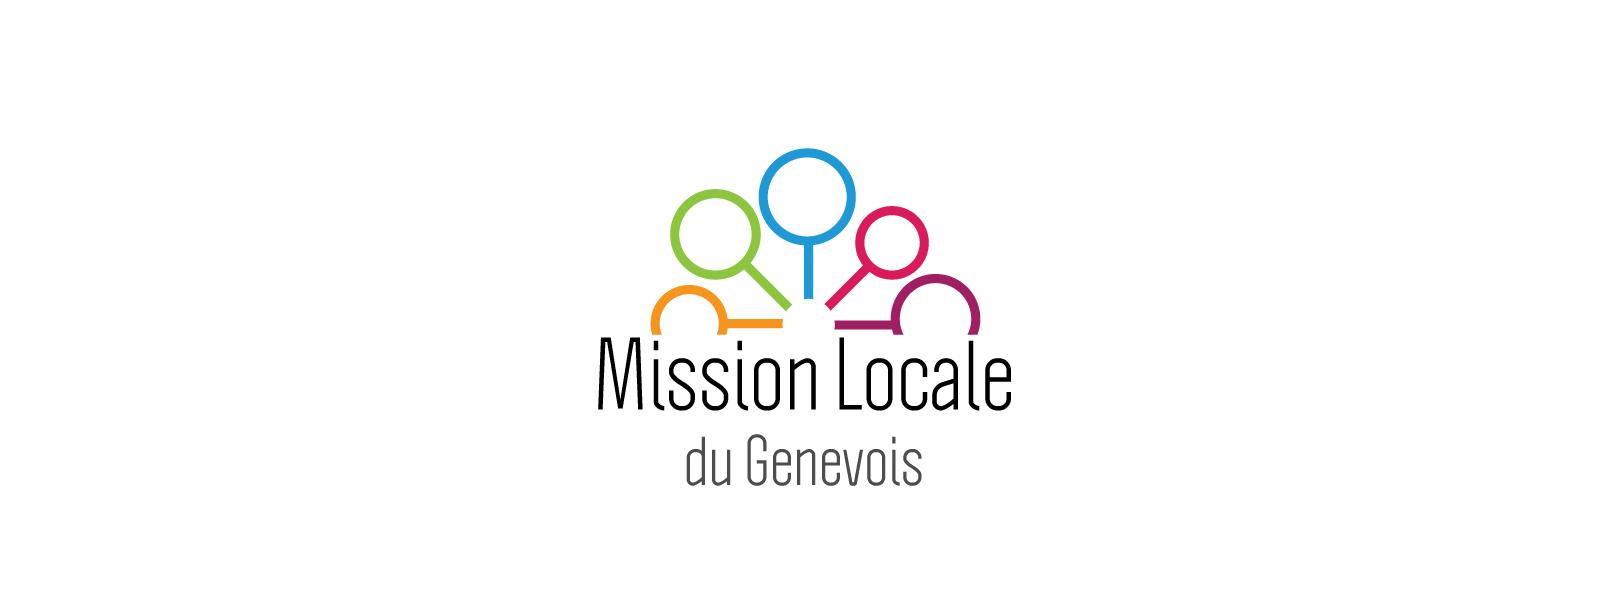 Mission Locale du Genevois